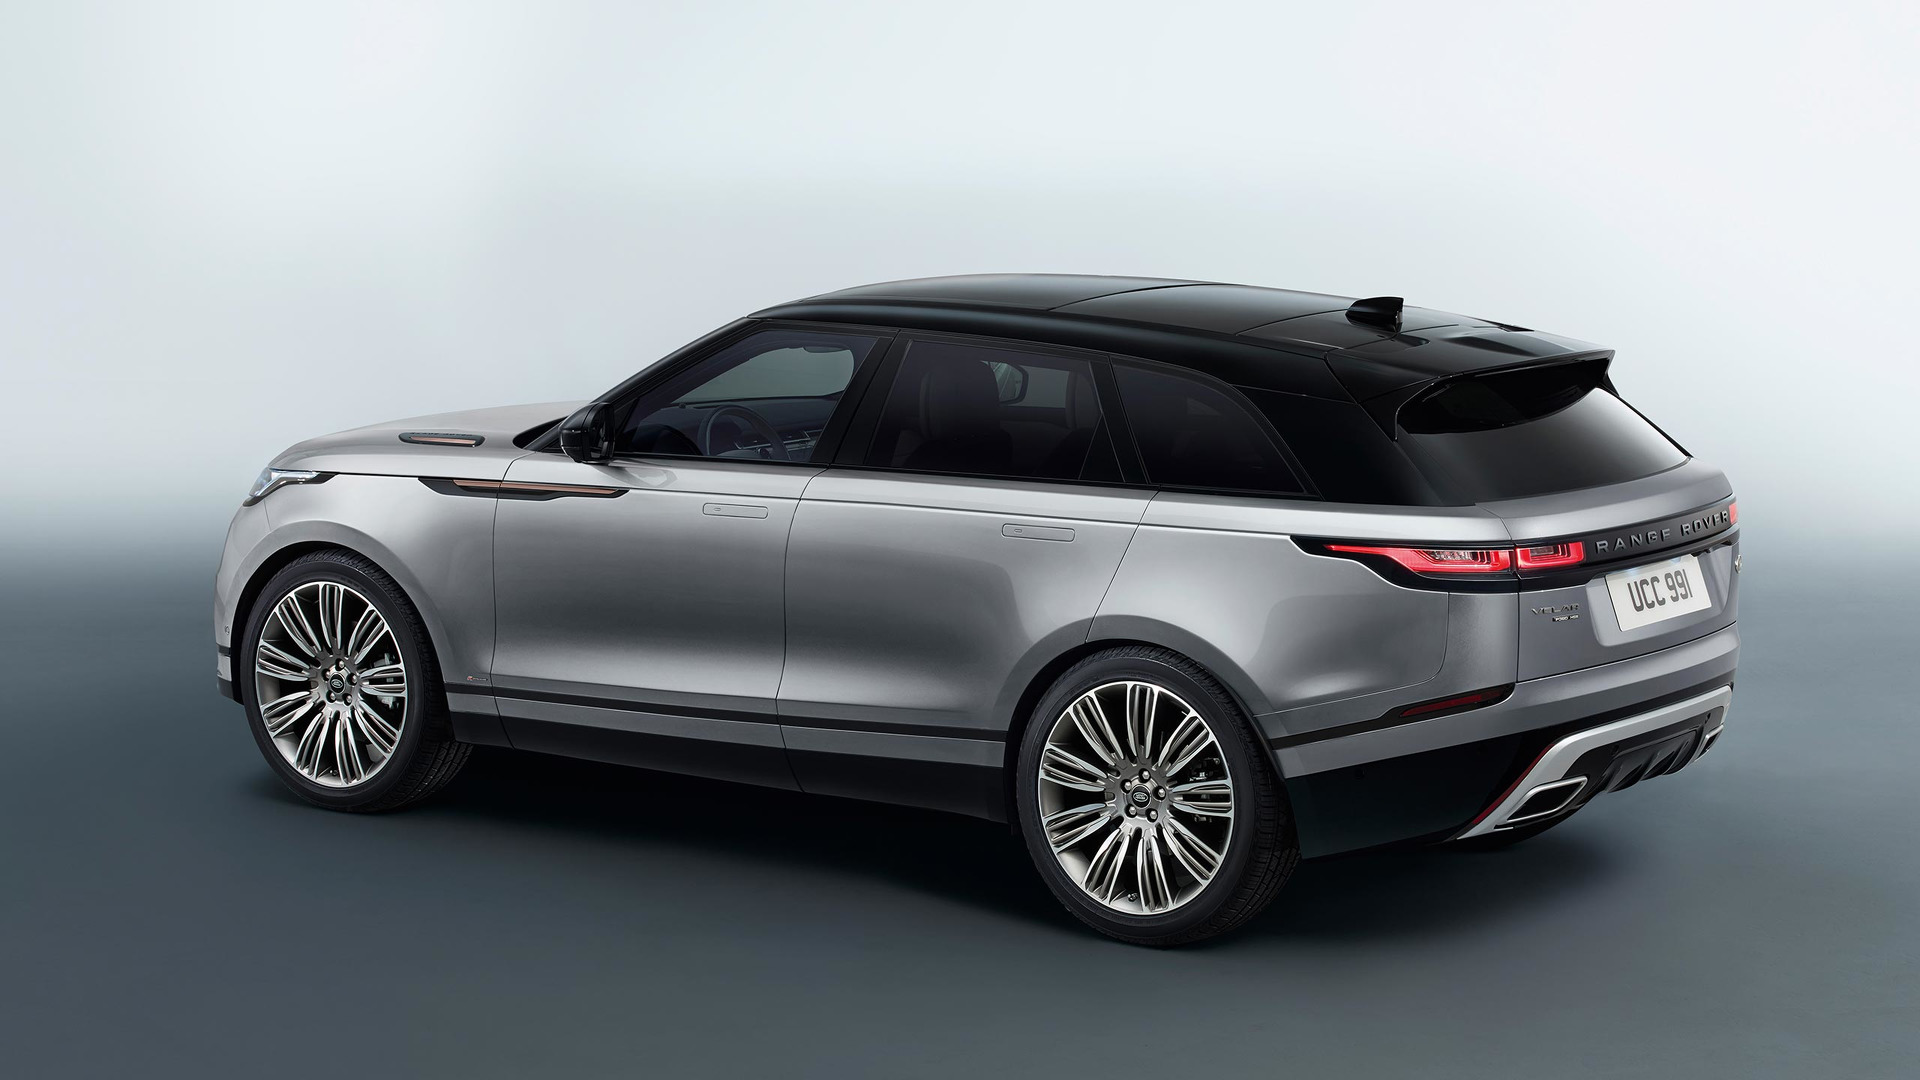 Range Rover Velar web documentary goes behind the scenes on